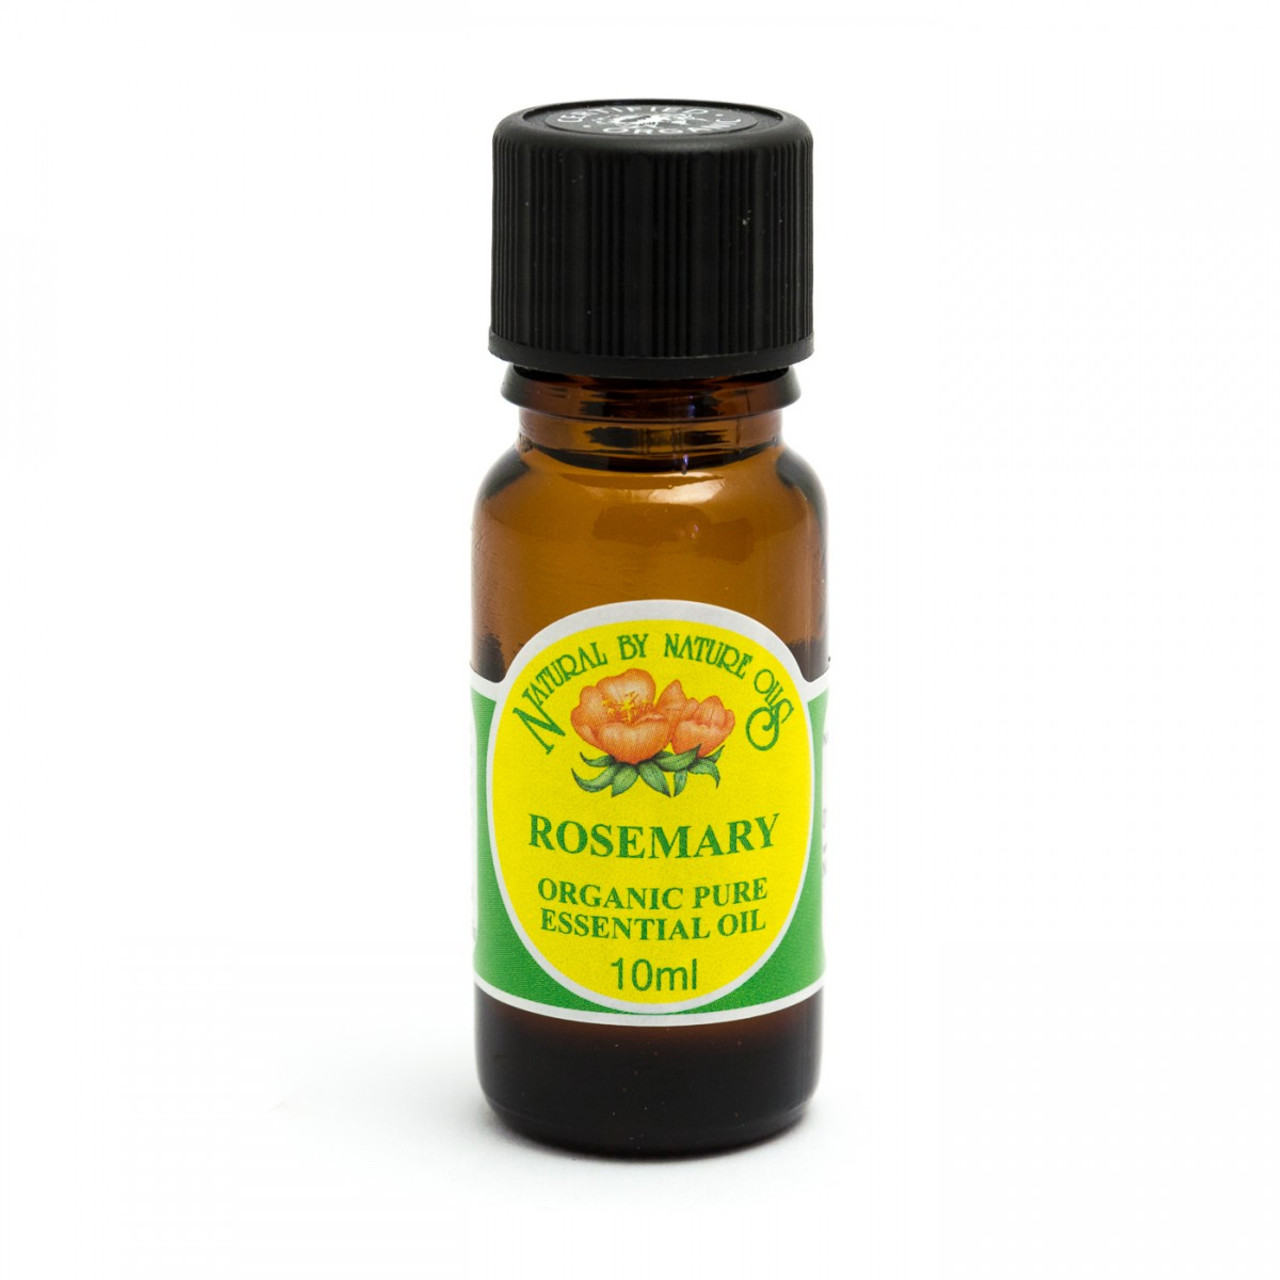 Rosemary Organic Pure Essential Oil (Morocco) 10ml